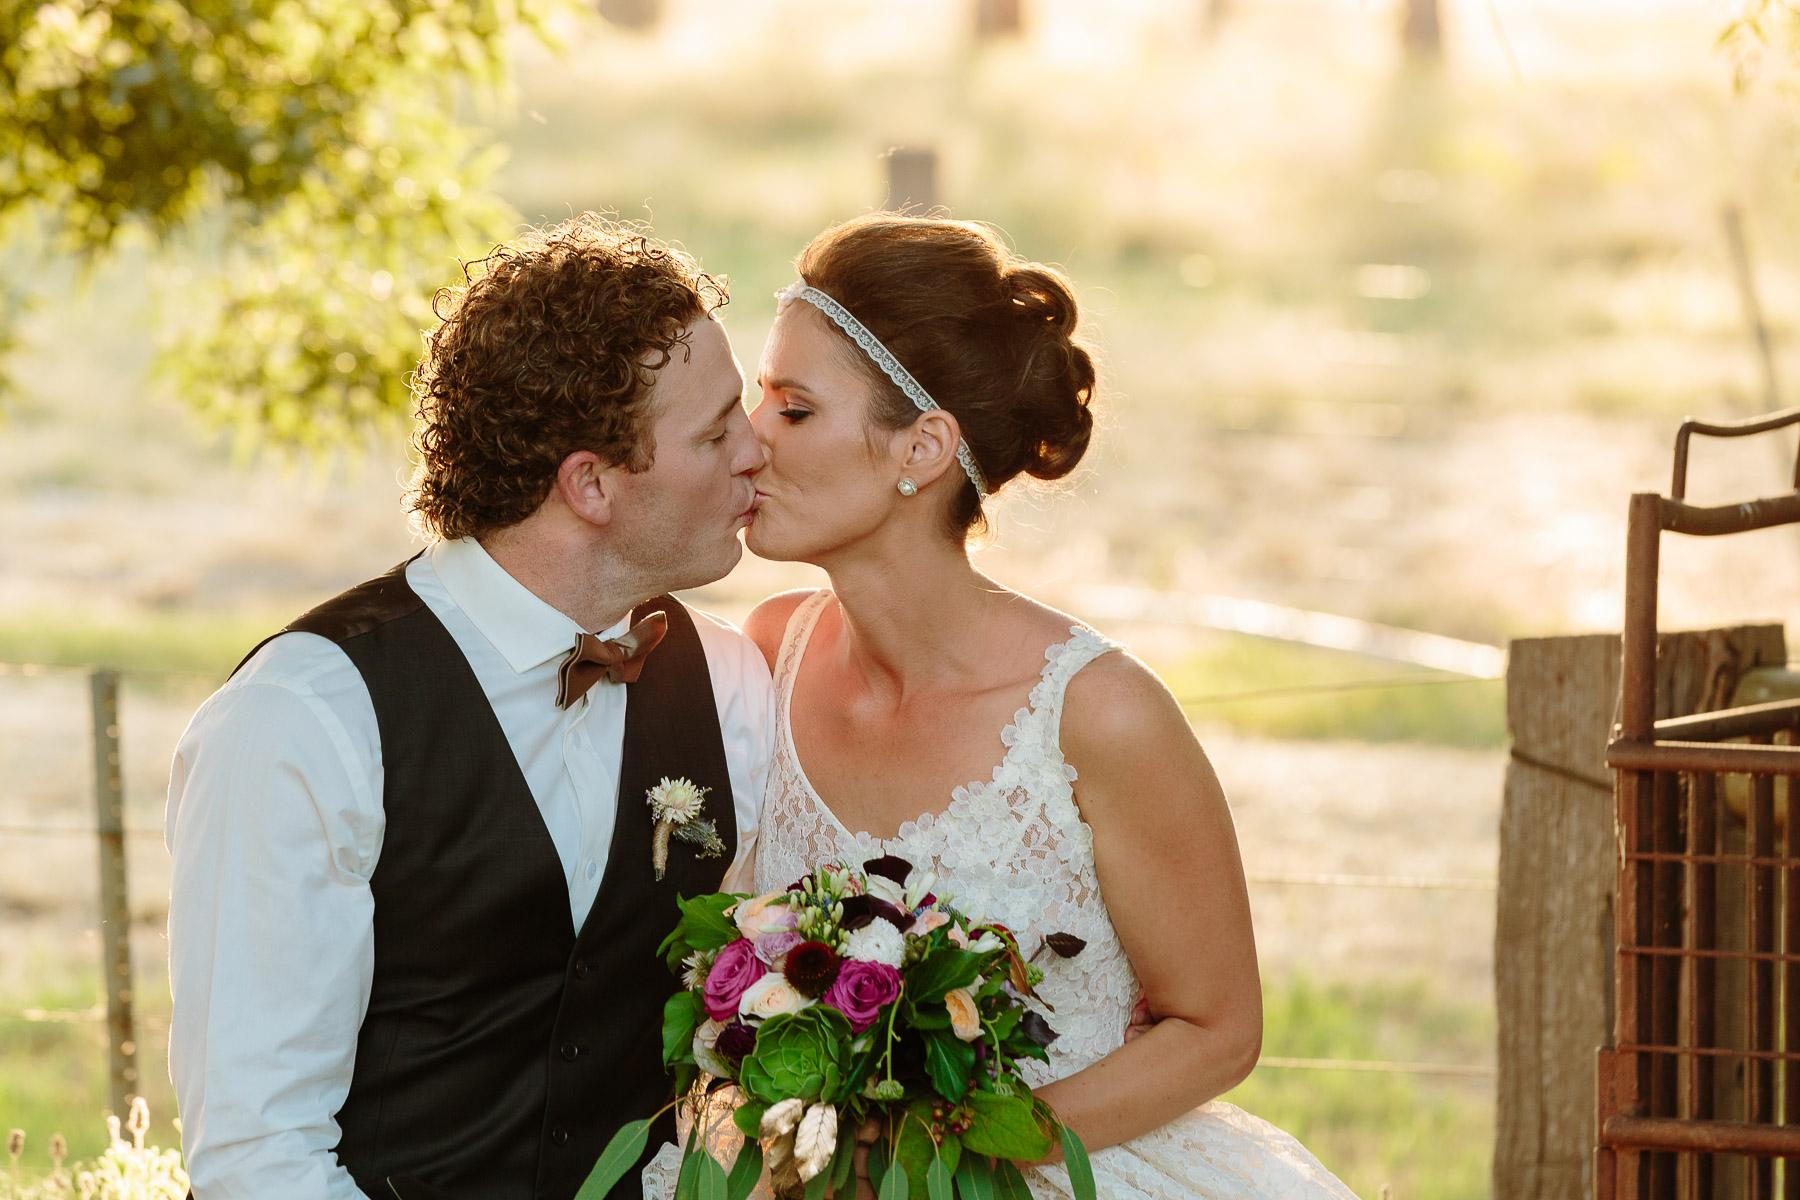 Melissa_and_Kristan_Echuca_Farm_Wedding_New_Years_Eve-98.jpg